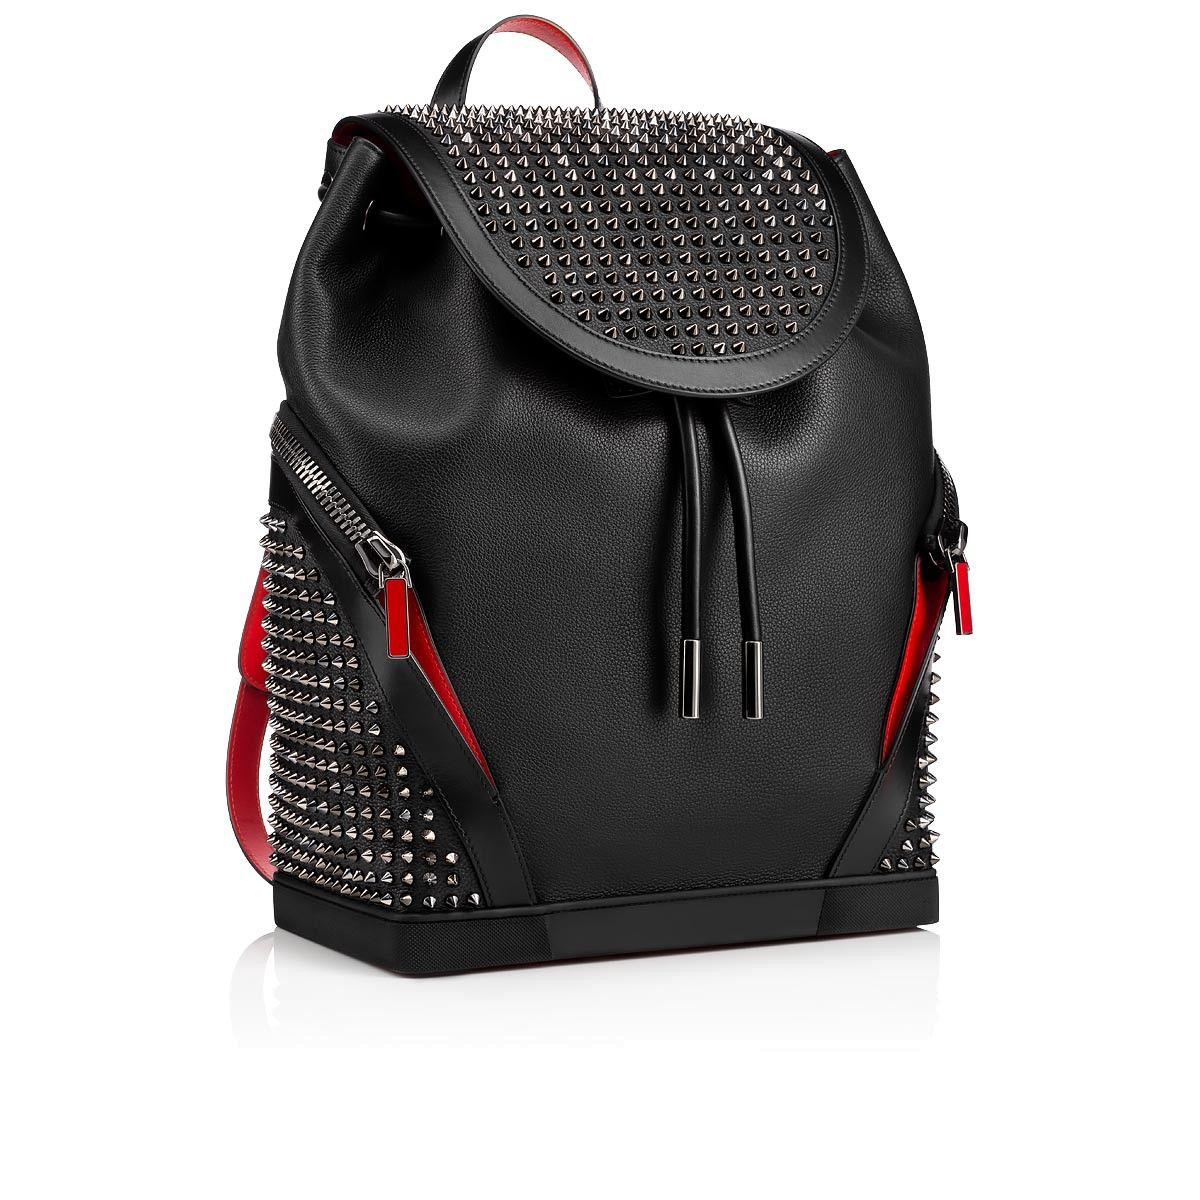 10ea4c897cd Bags - Explorafunk Backpack - Christian Louboutin   Future purchases ...